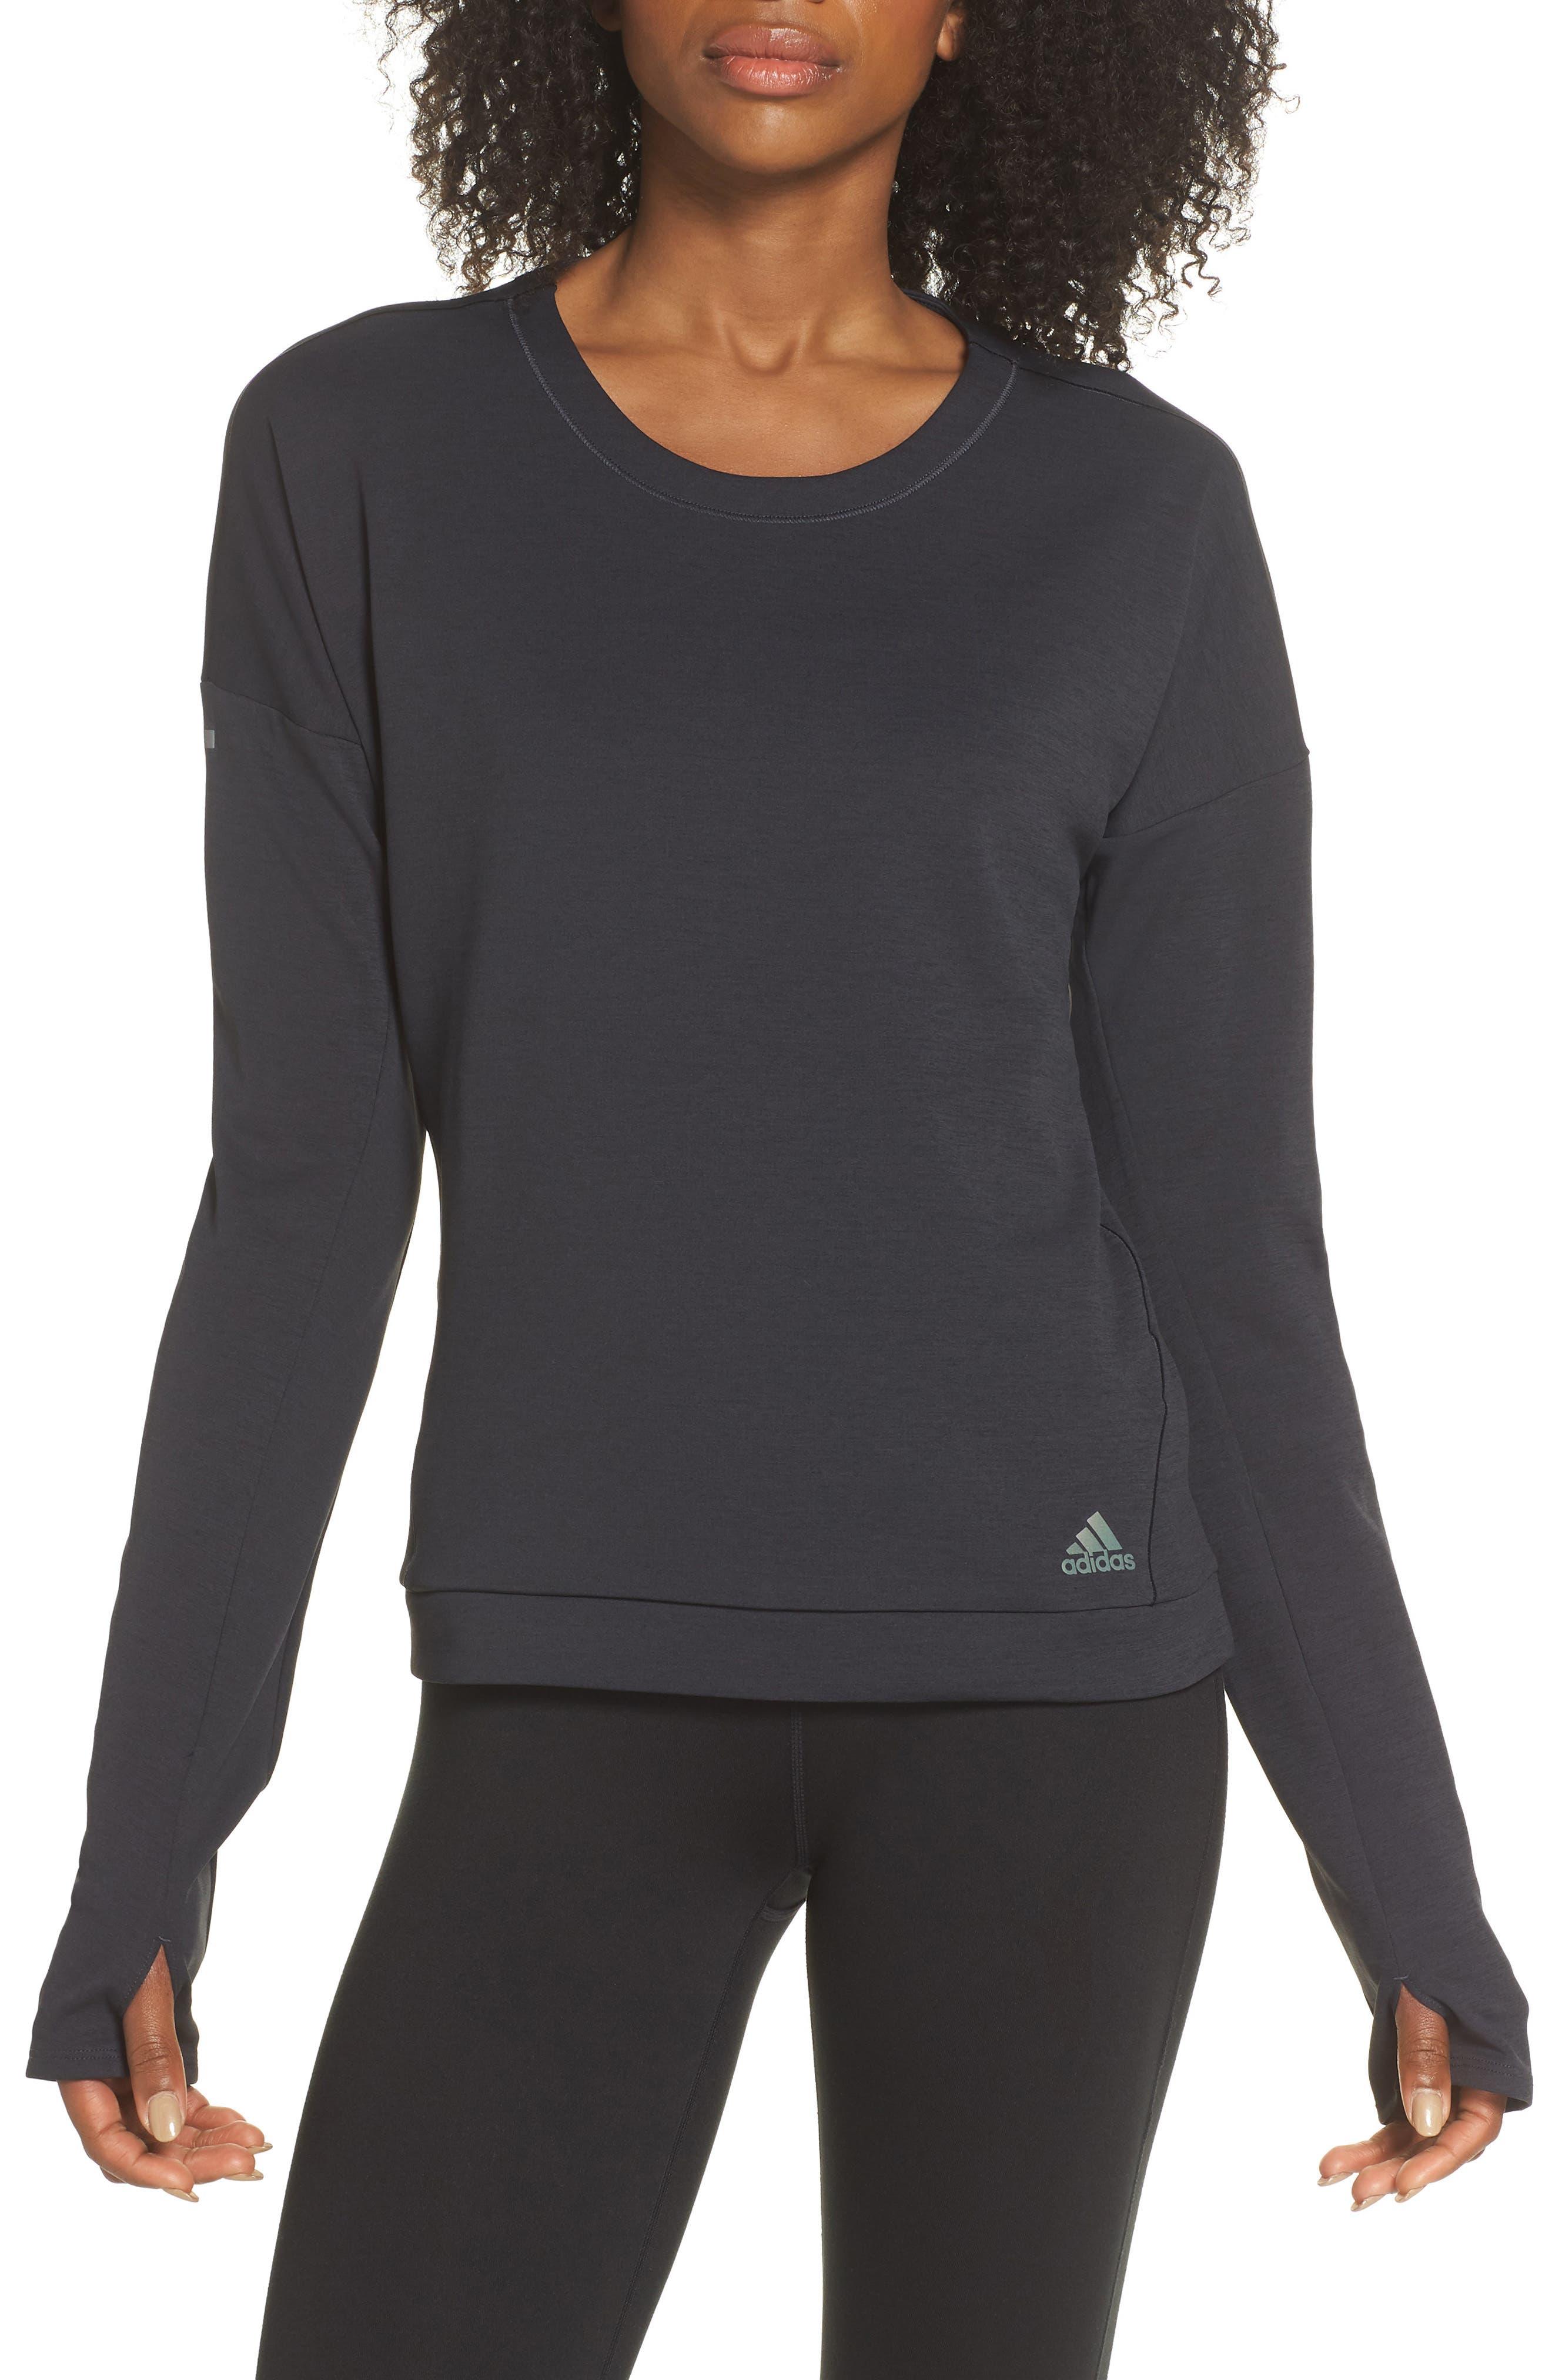 Supernova Run Sweatshirt,                         Main,                         color, BLACK/ COLORED HEATHER